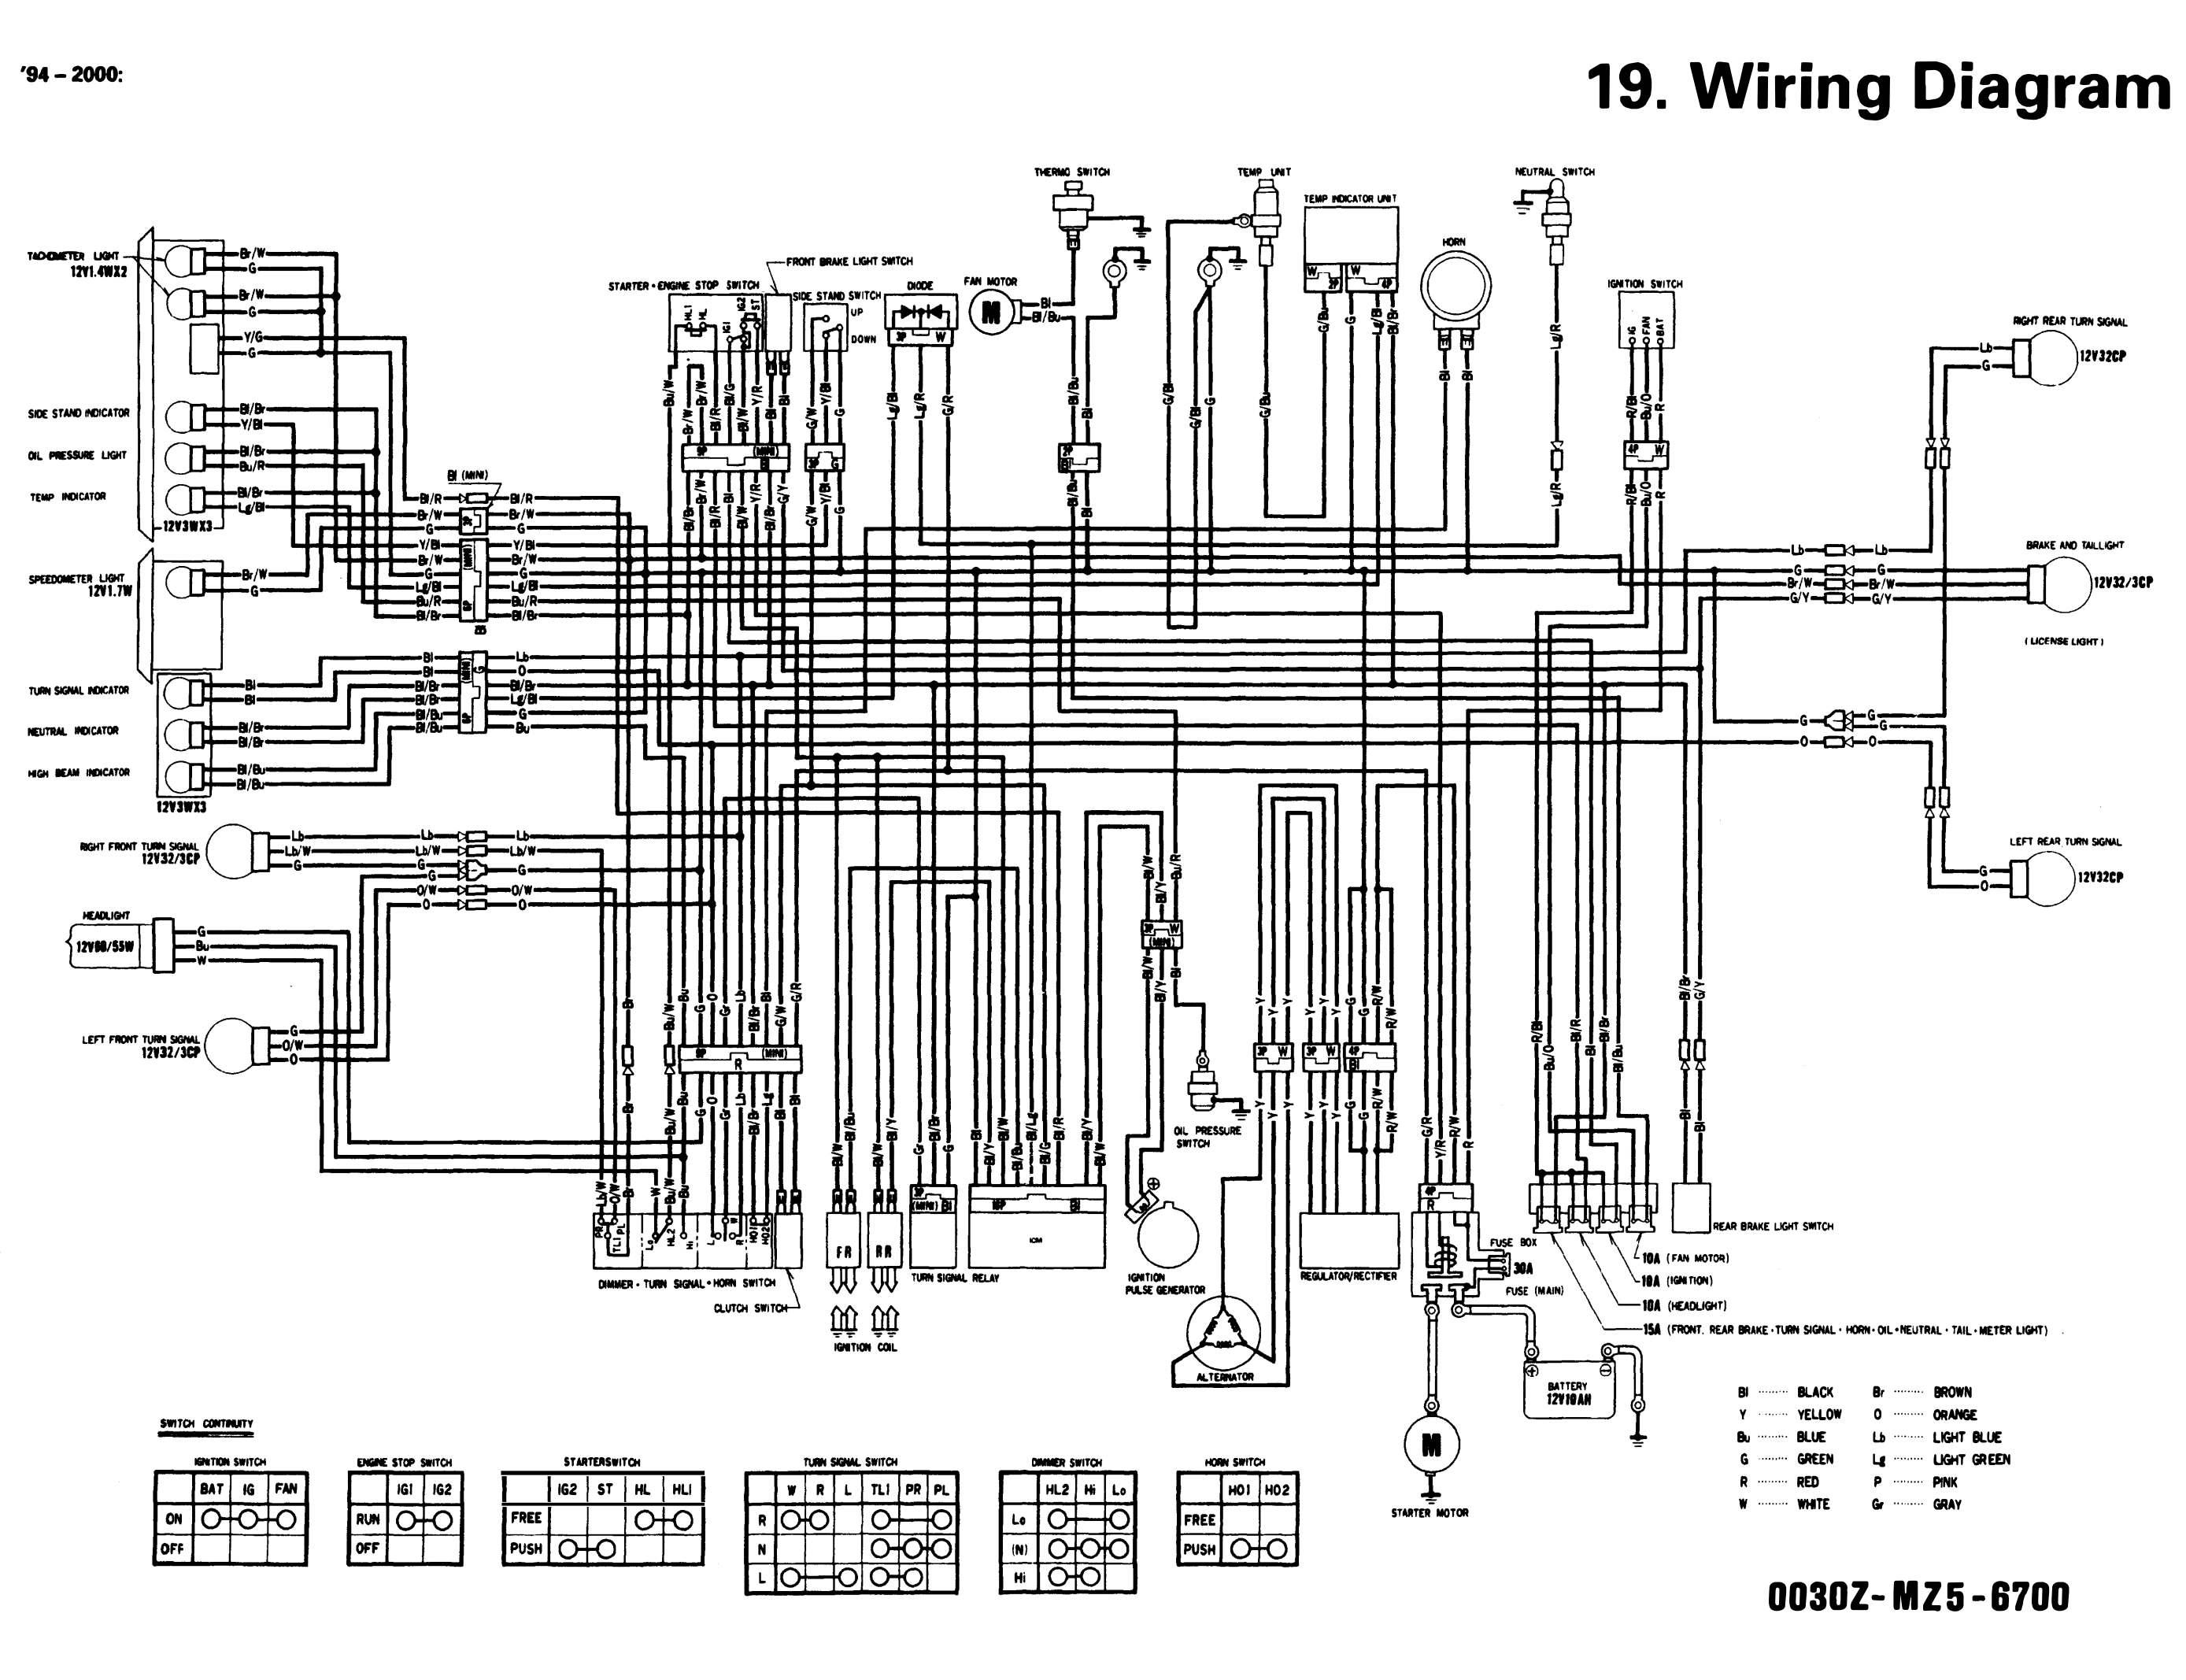 kawasaki klf 300 wiring diagram labeled of an atom bayou cdi box